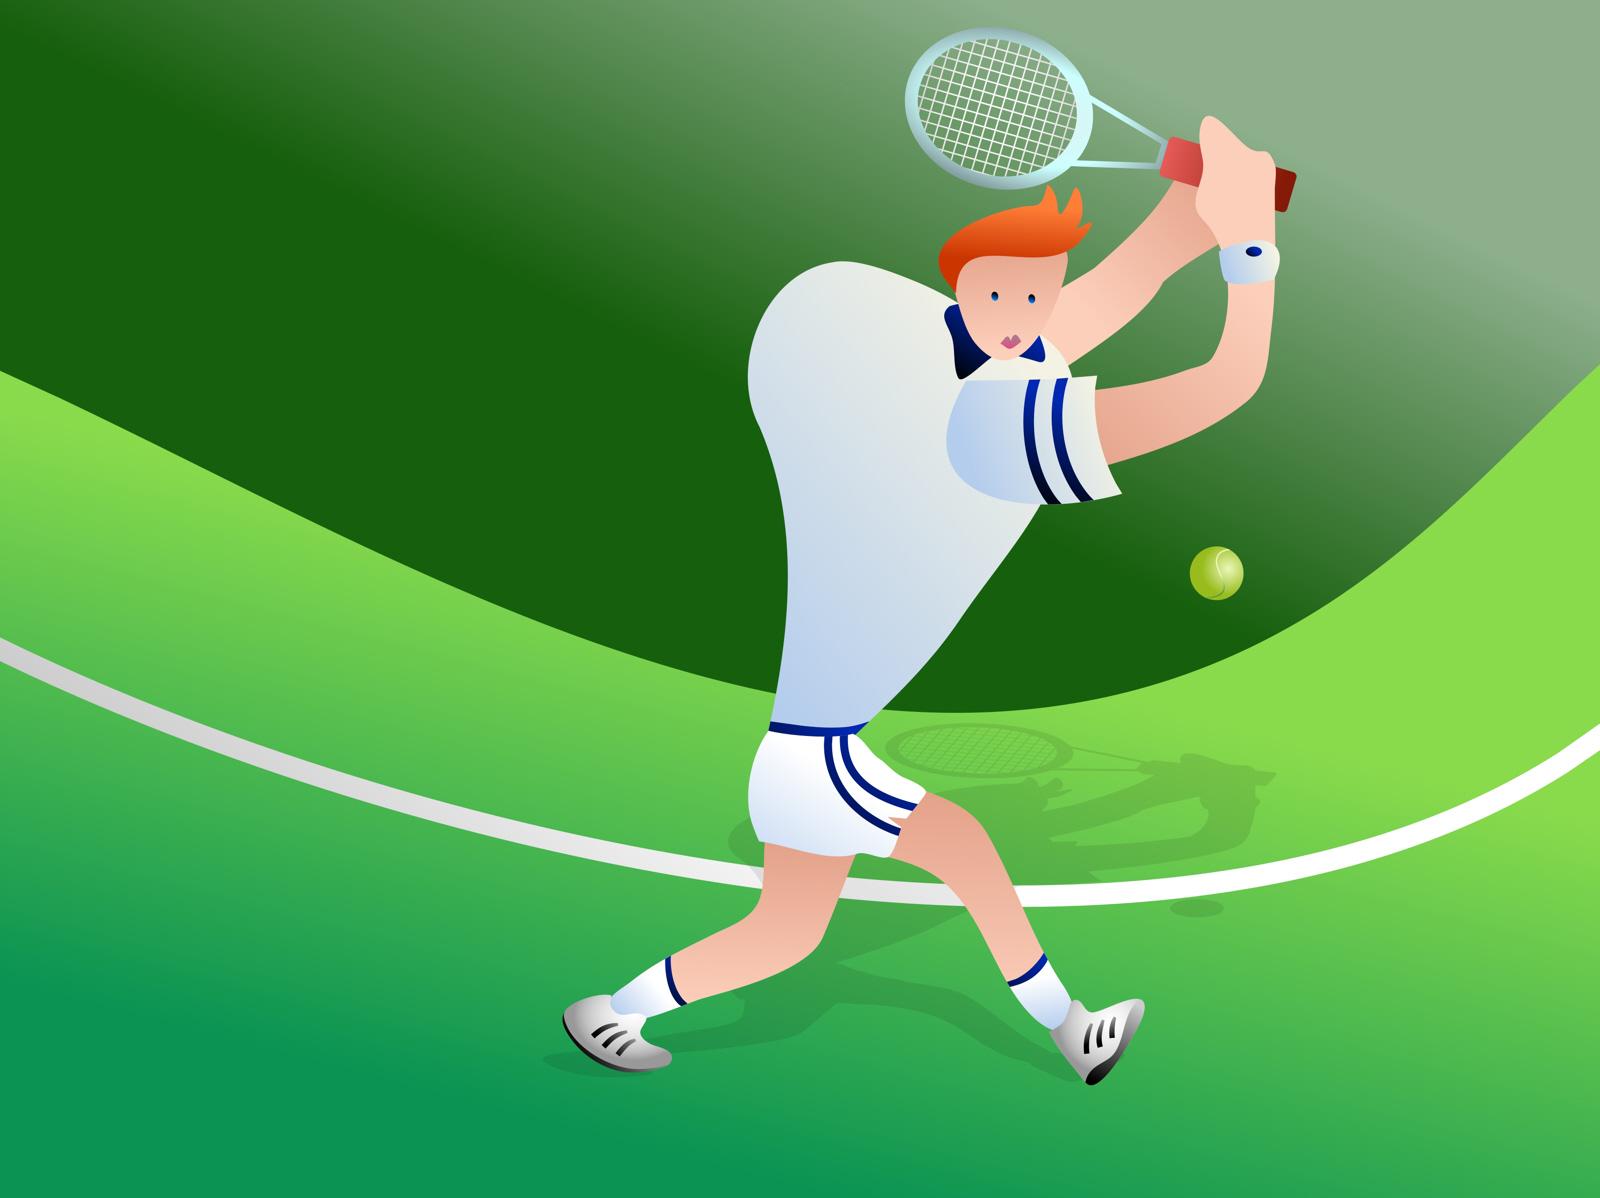 hight resolution of tennis clipart sport tennis recreation leisure hq photo